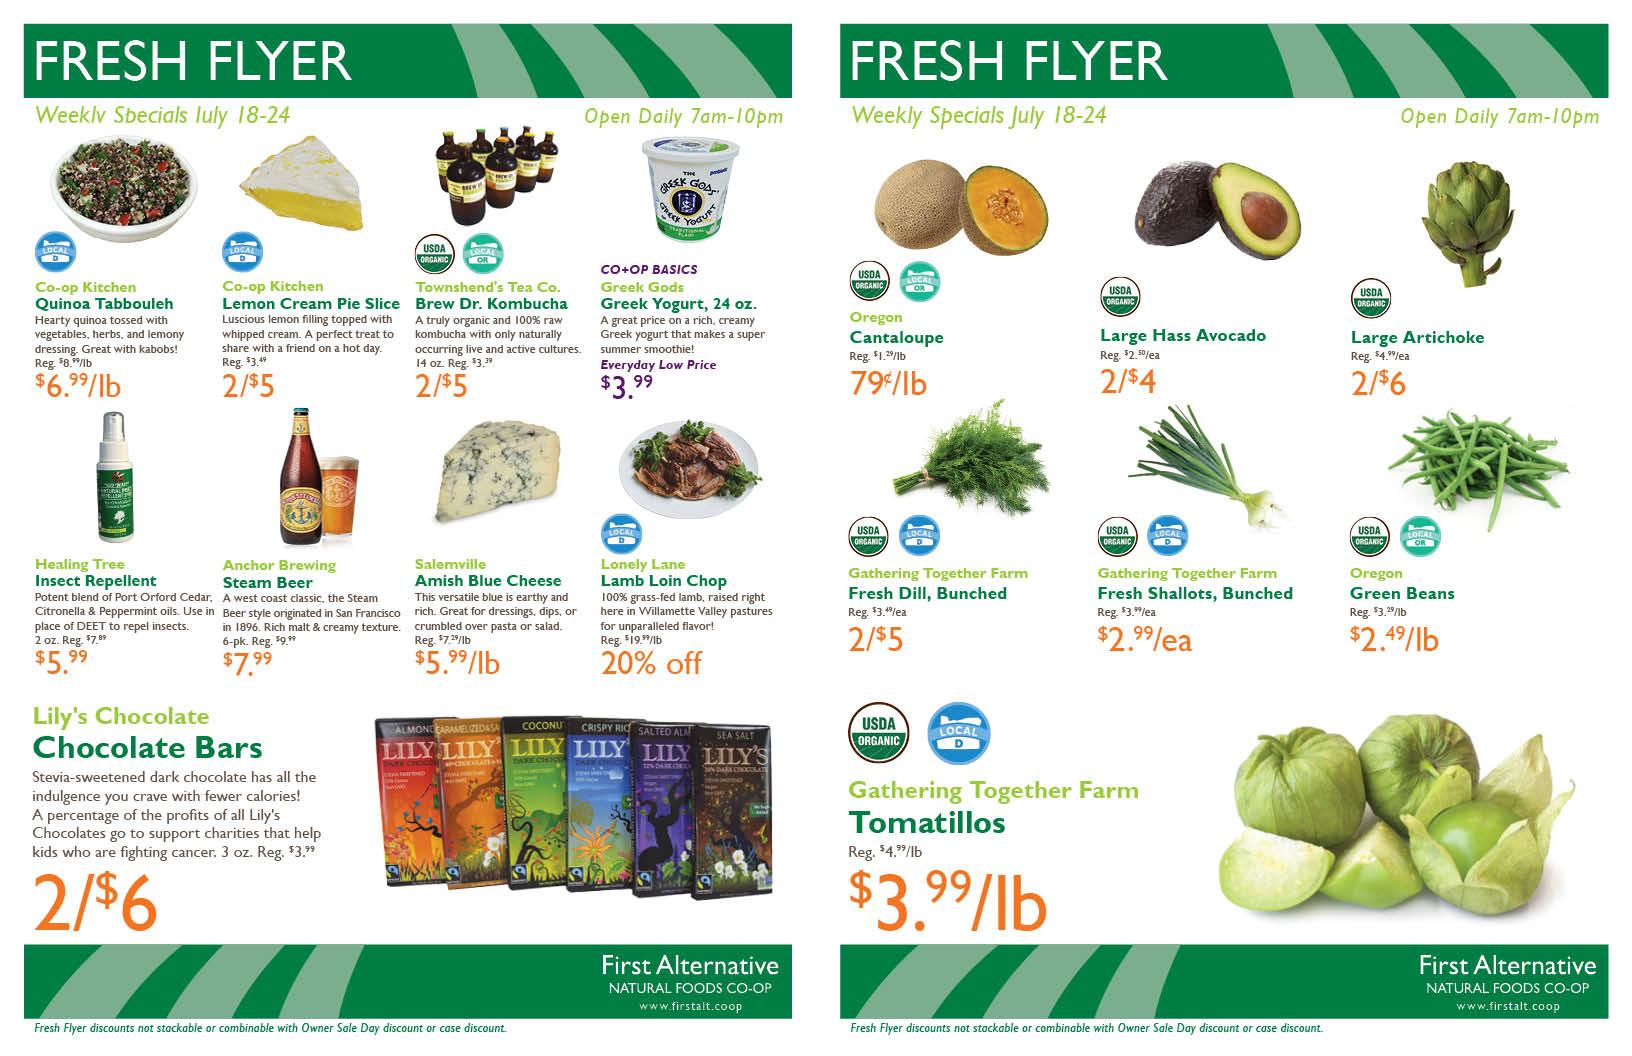 First Alternative Fresh Flyer July 18-24